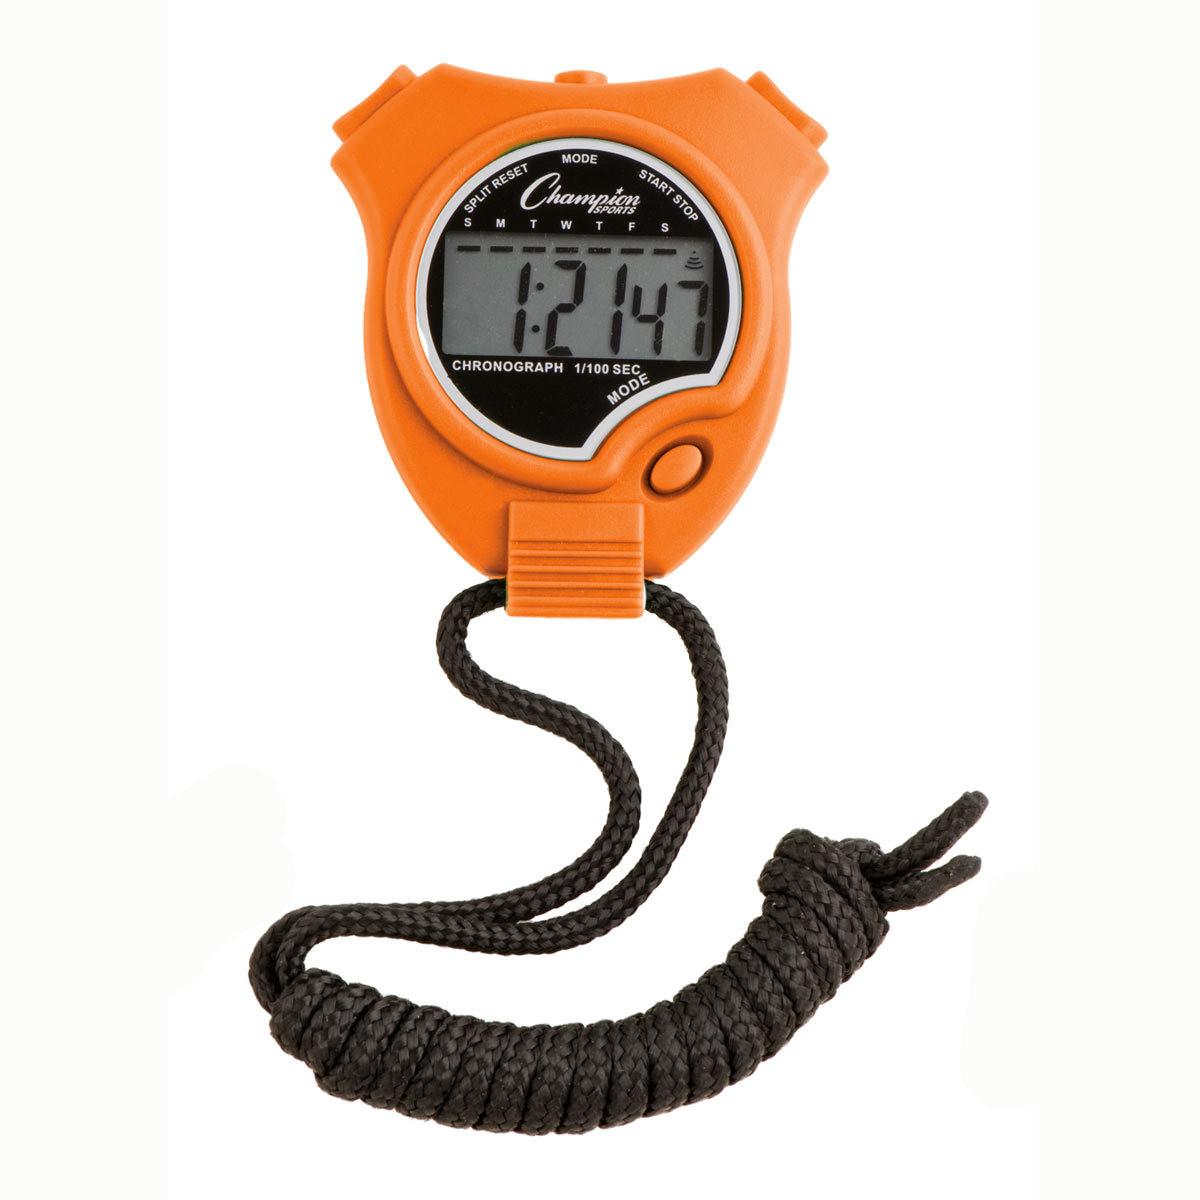 Champion Sports 910 Stopwatch and Timer Orange